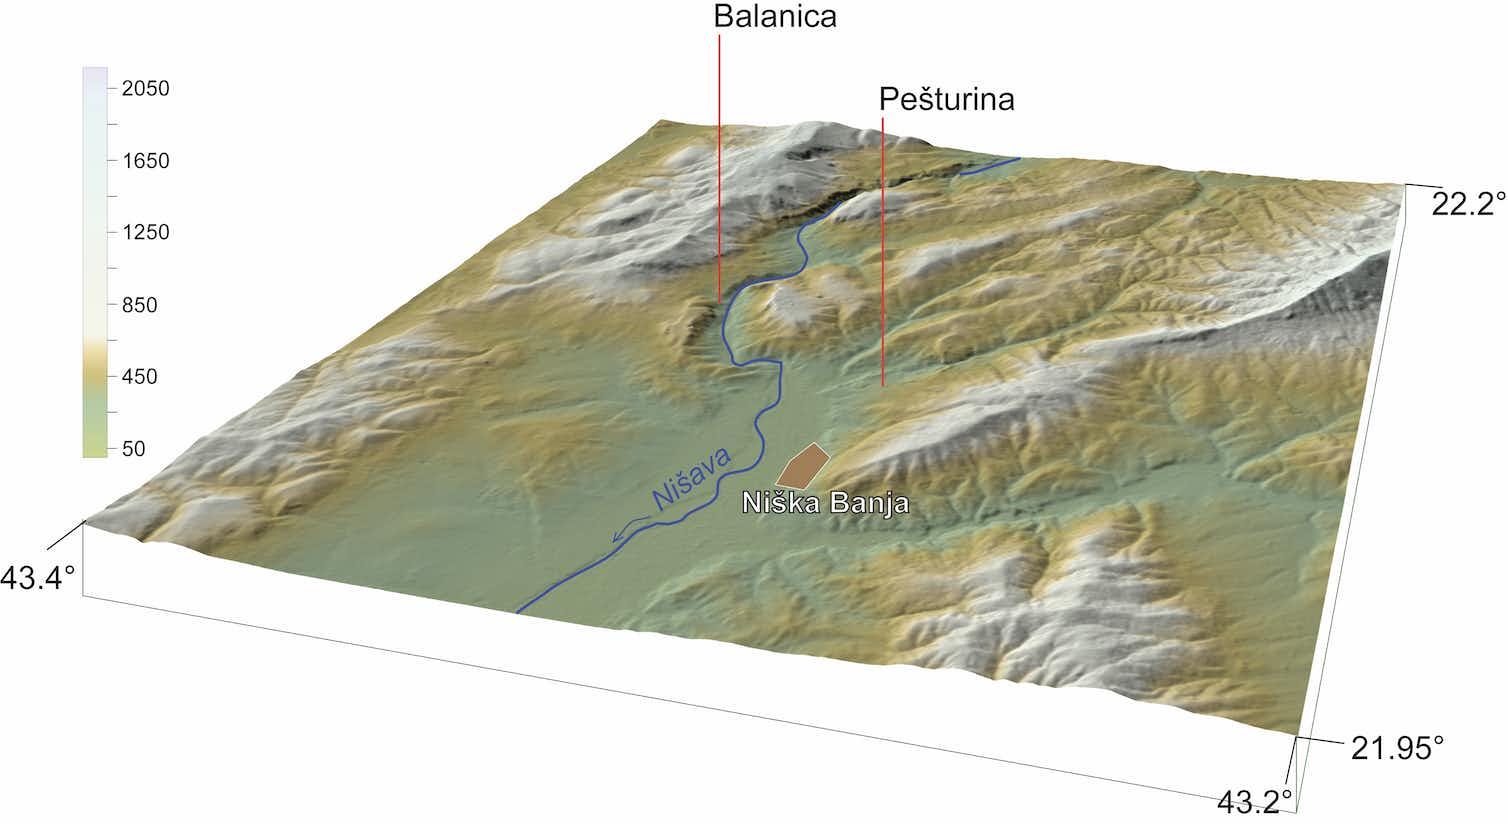 A map showing Pešturina's location. Credit: Miloš Radonjić, Author provided